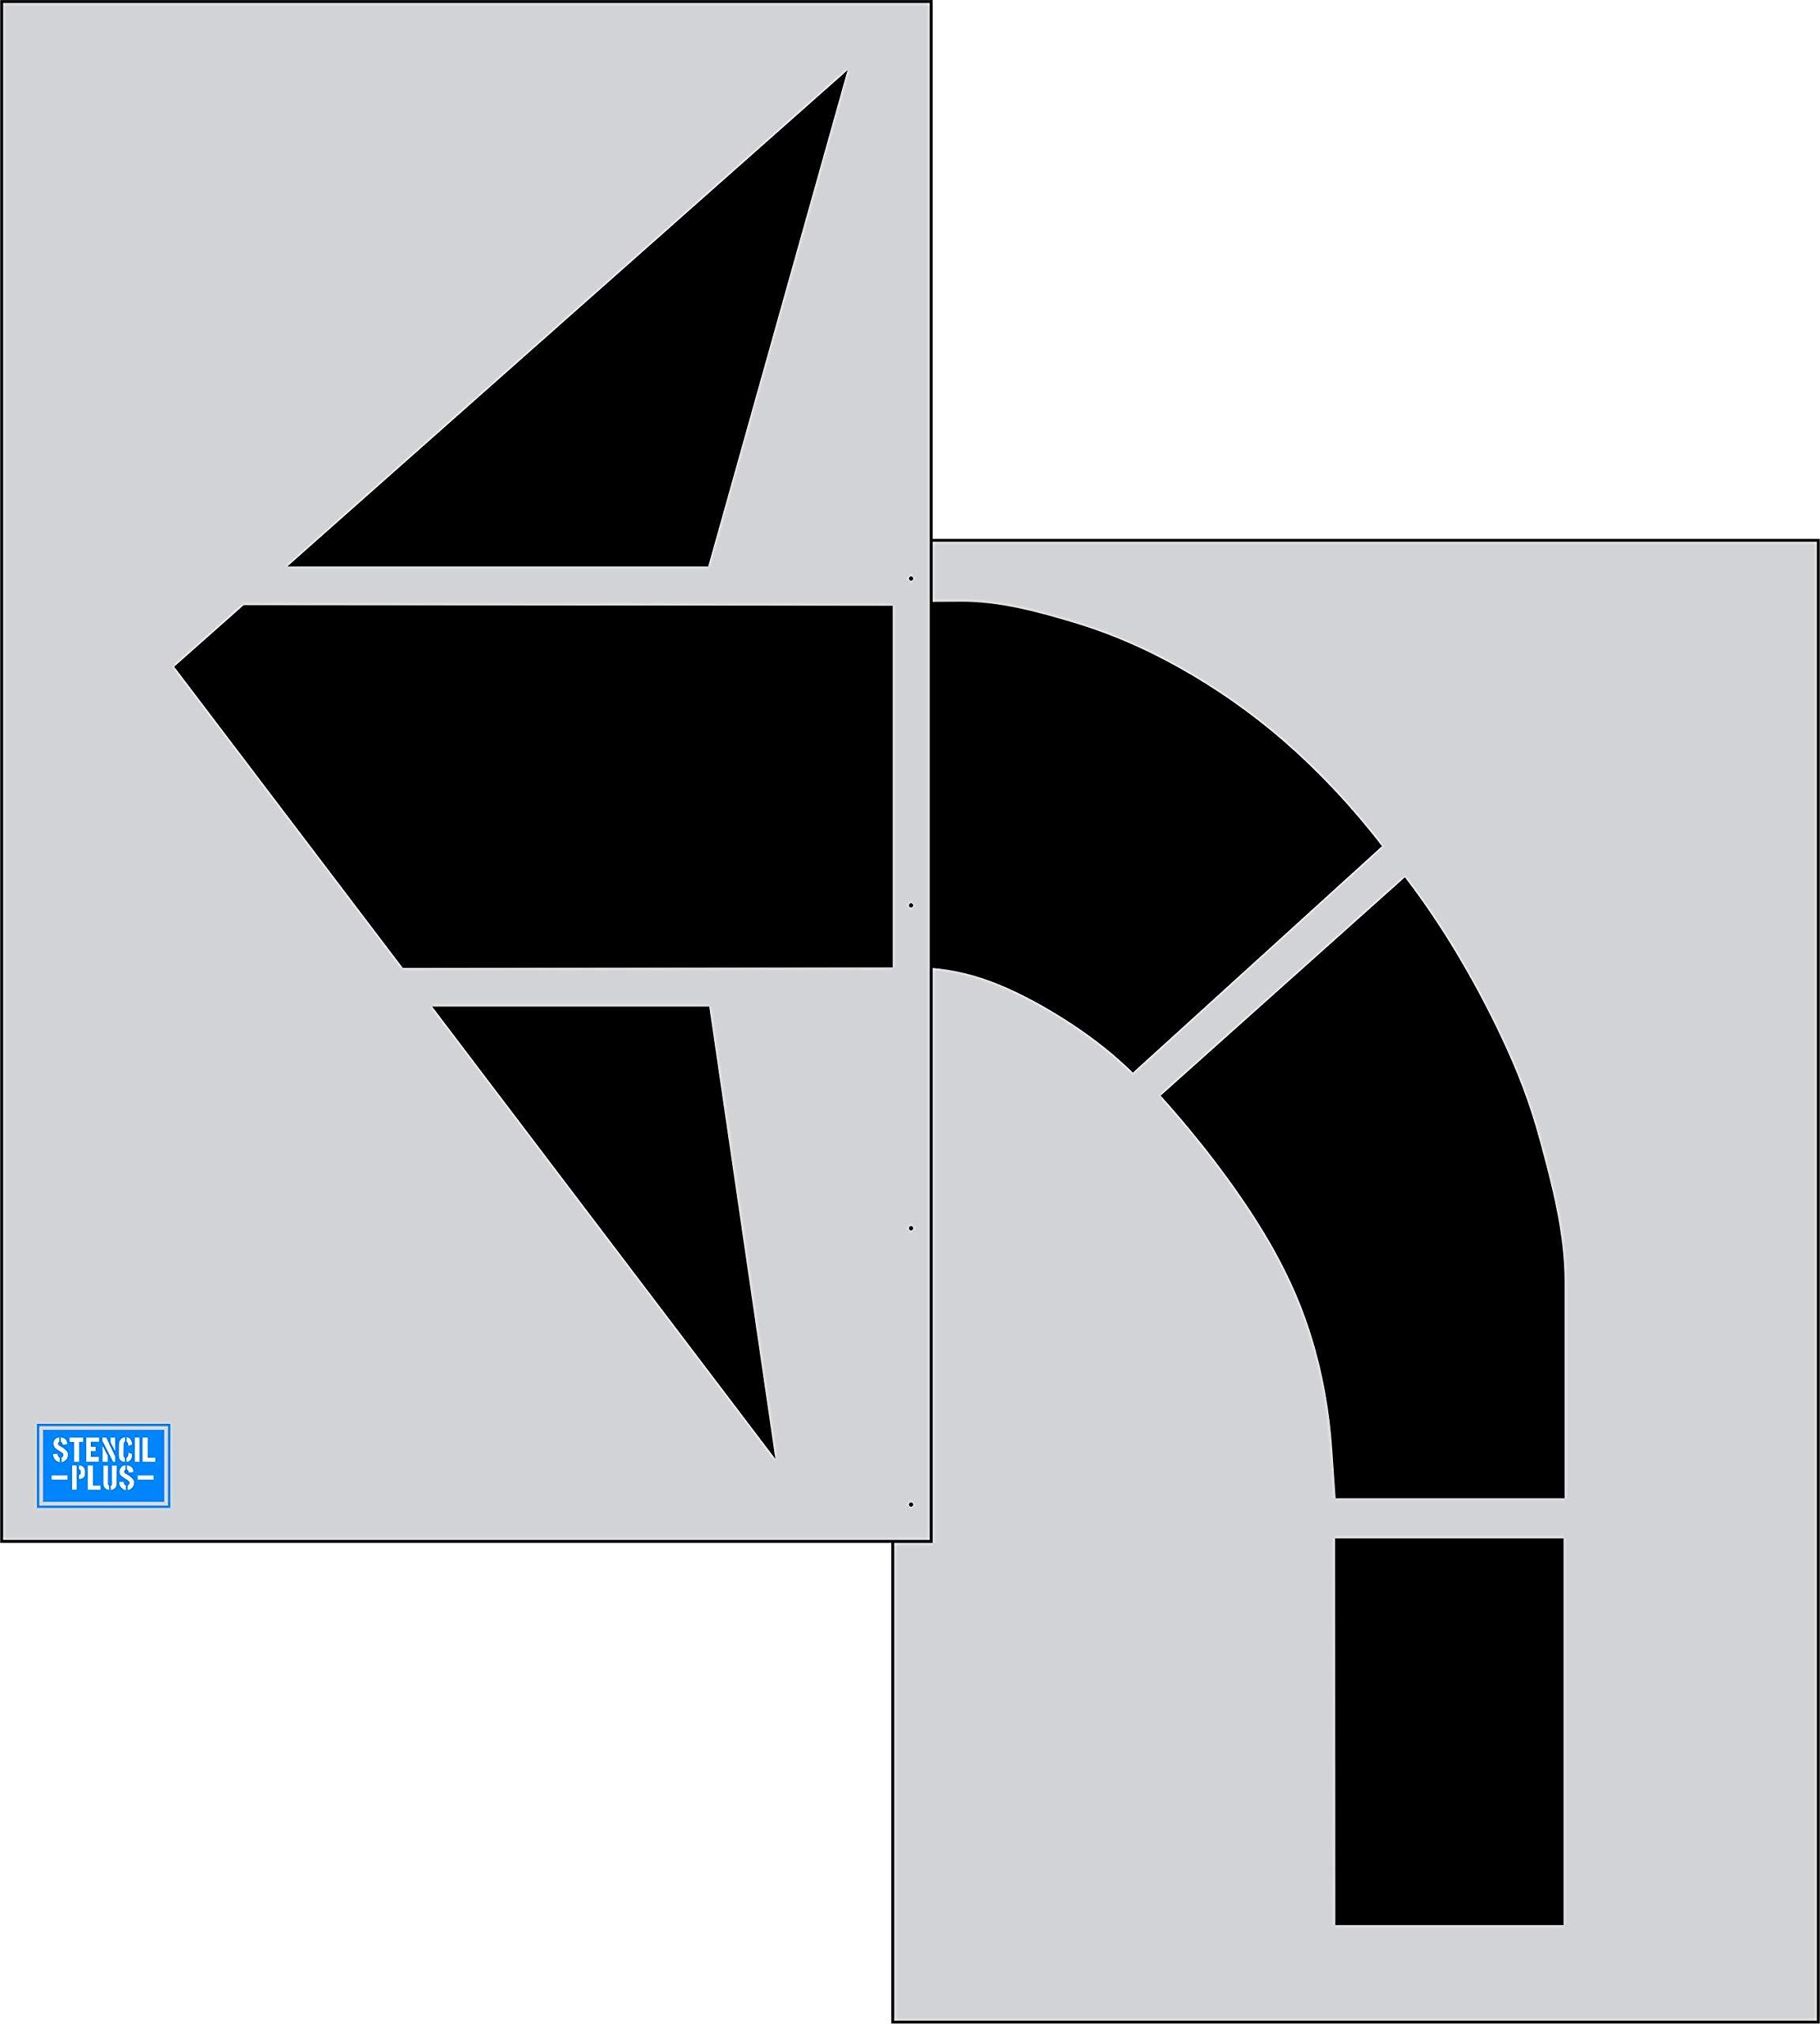 96'' FHWA/DOT Turn Arrow 2 PC Pavement Marking Stencil by Stencil Plus